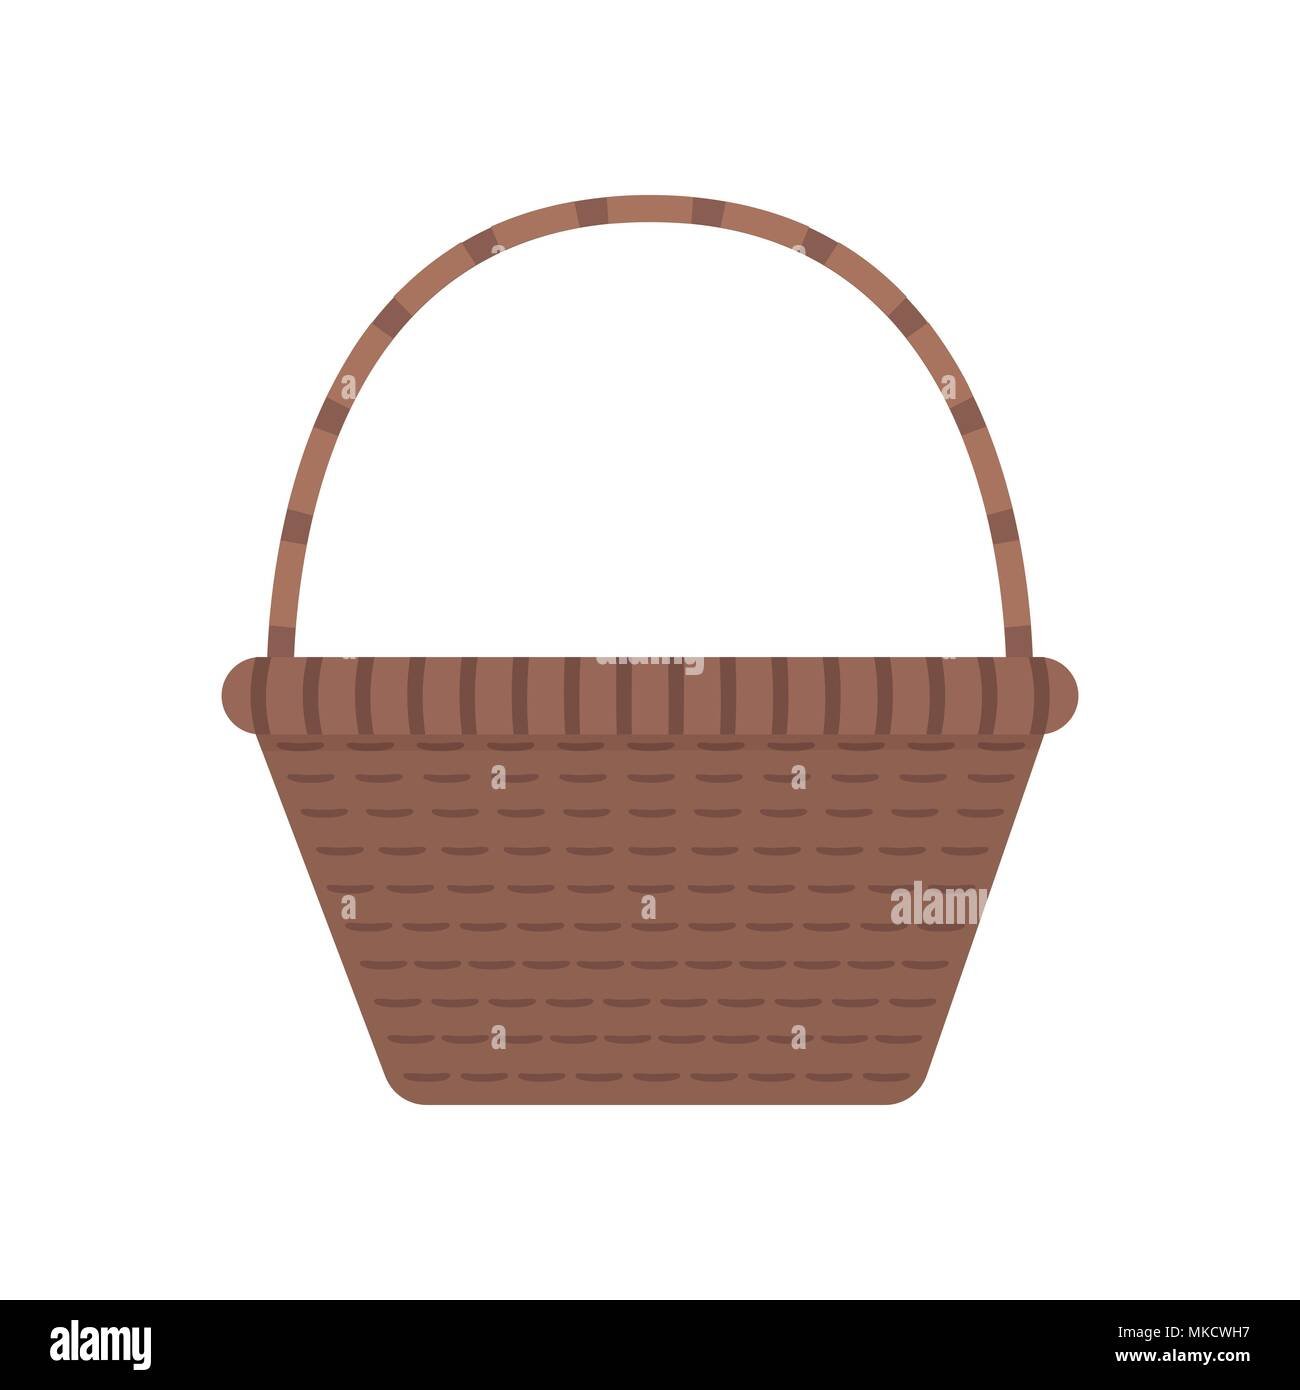 Wicker basket icon in flat design. - Stock Vector